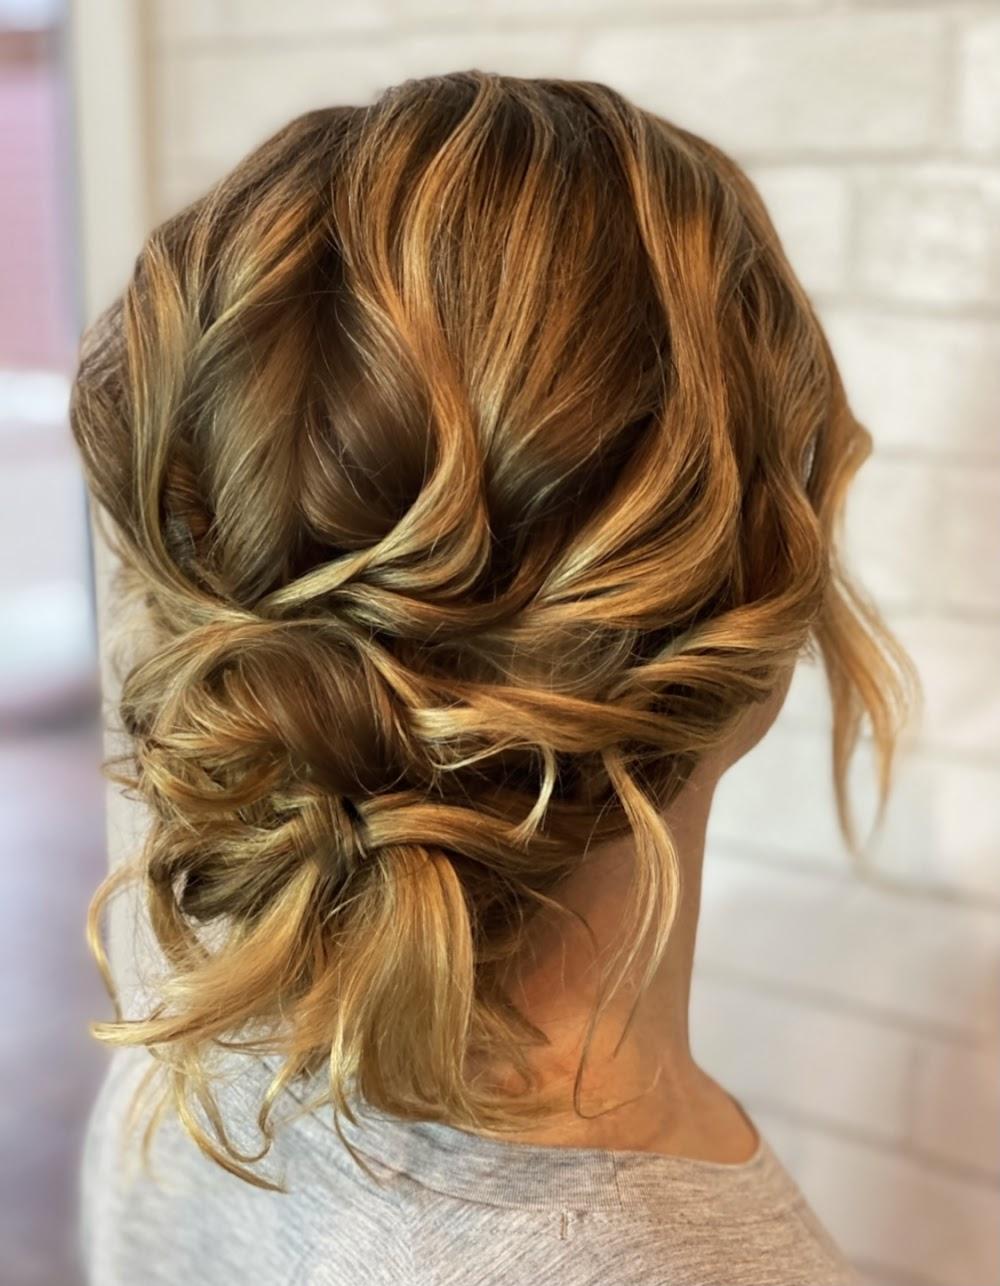 Patty McGuire Hair & Makeup Artists